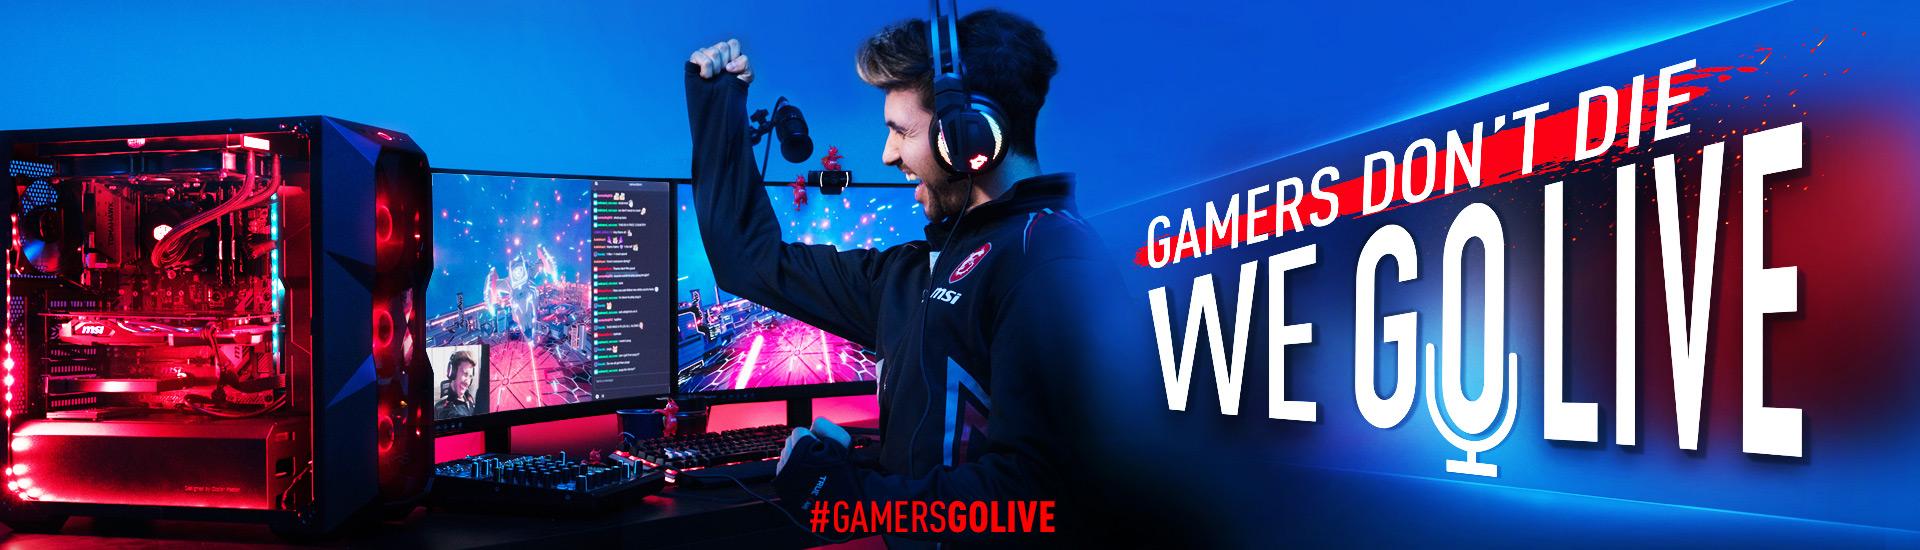 B450 GamersGoLive campaign